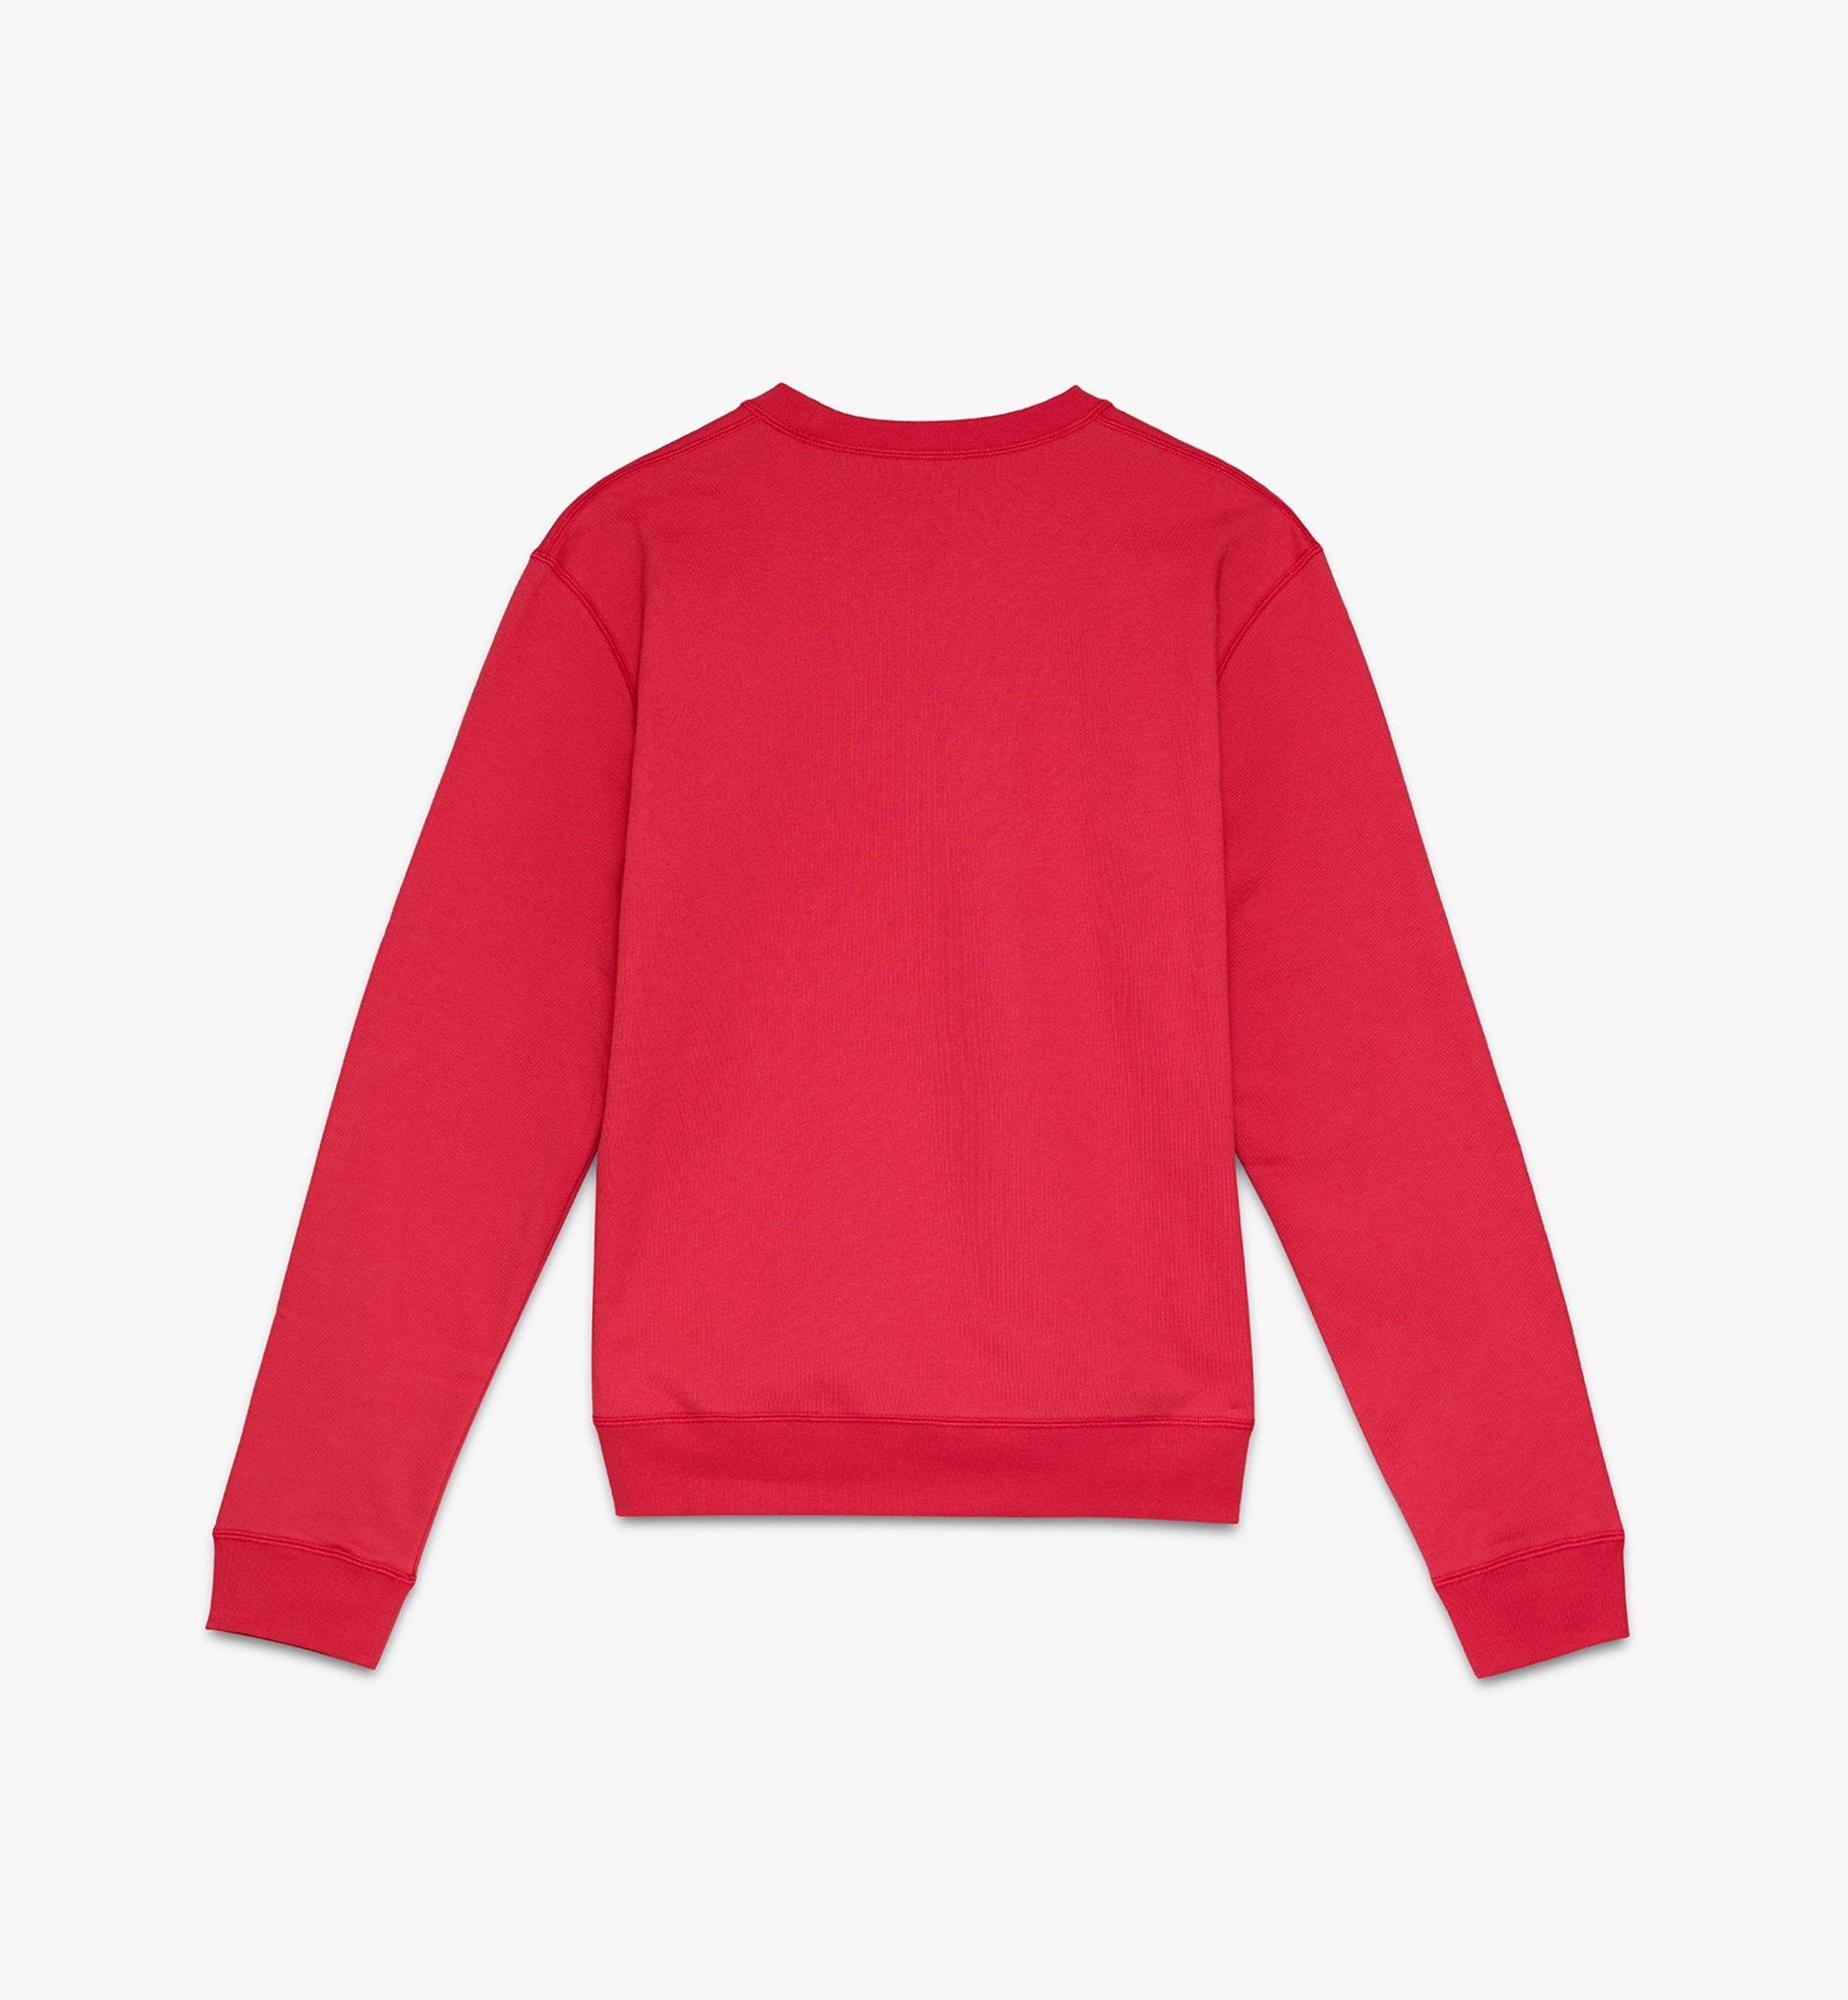 MCM Men's Year Of The Mouse Mockneck Sweatshirt Red MHAASSE02R400L Alternate View 1